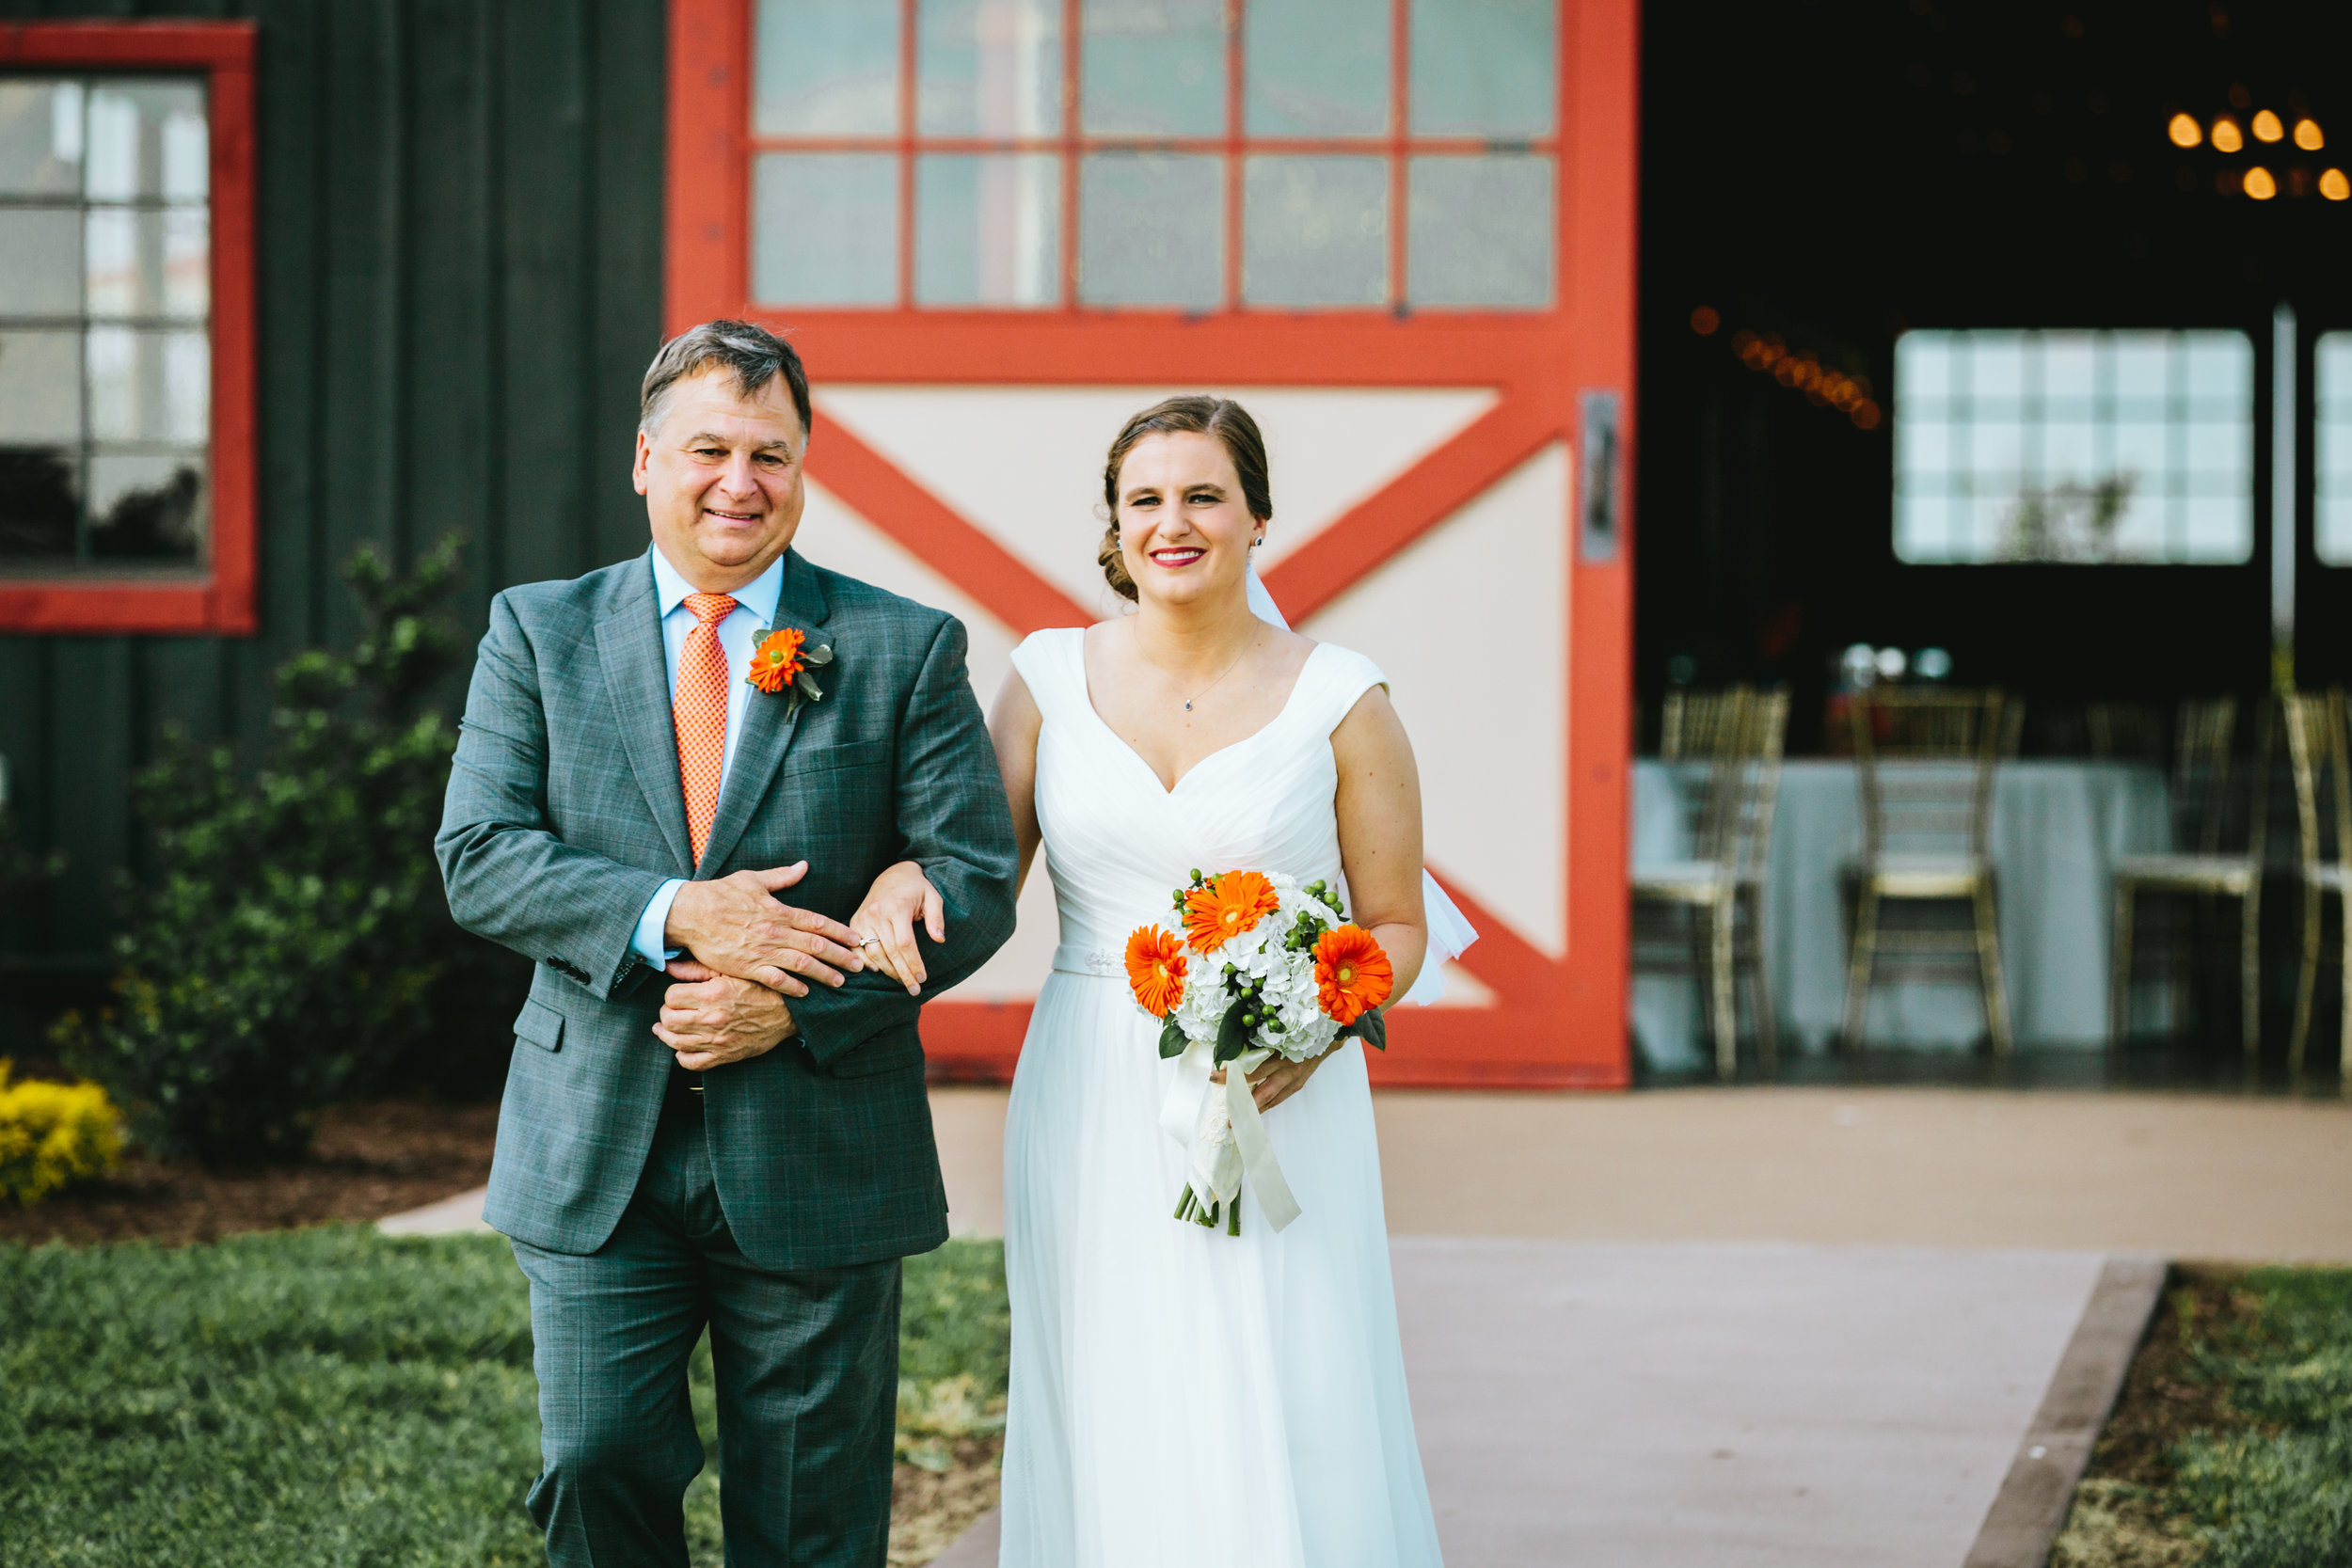 Whitesell-Mattioda Wedding-569.jpg